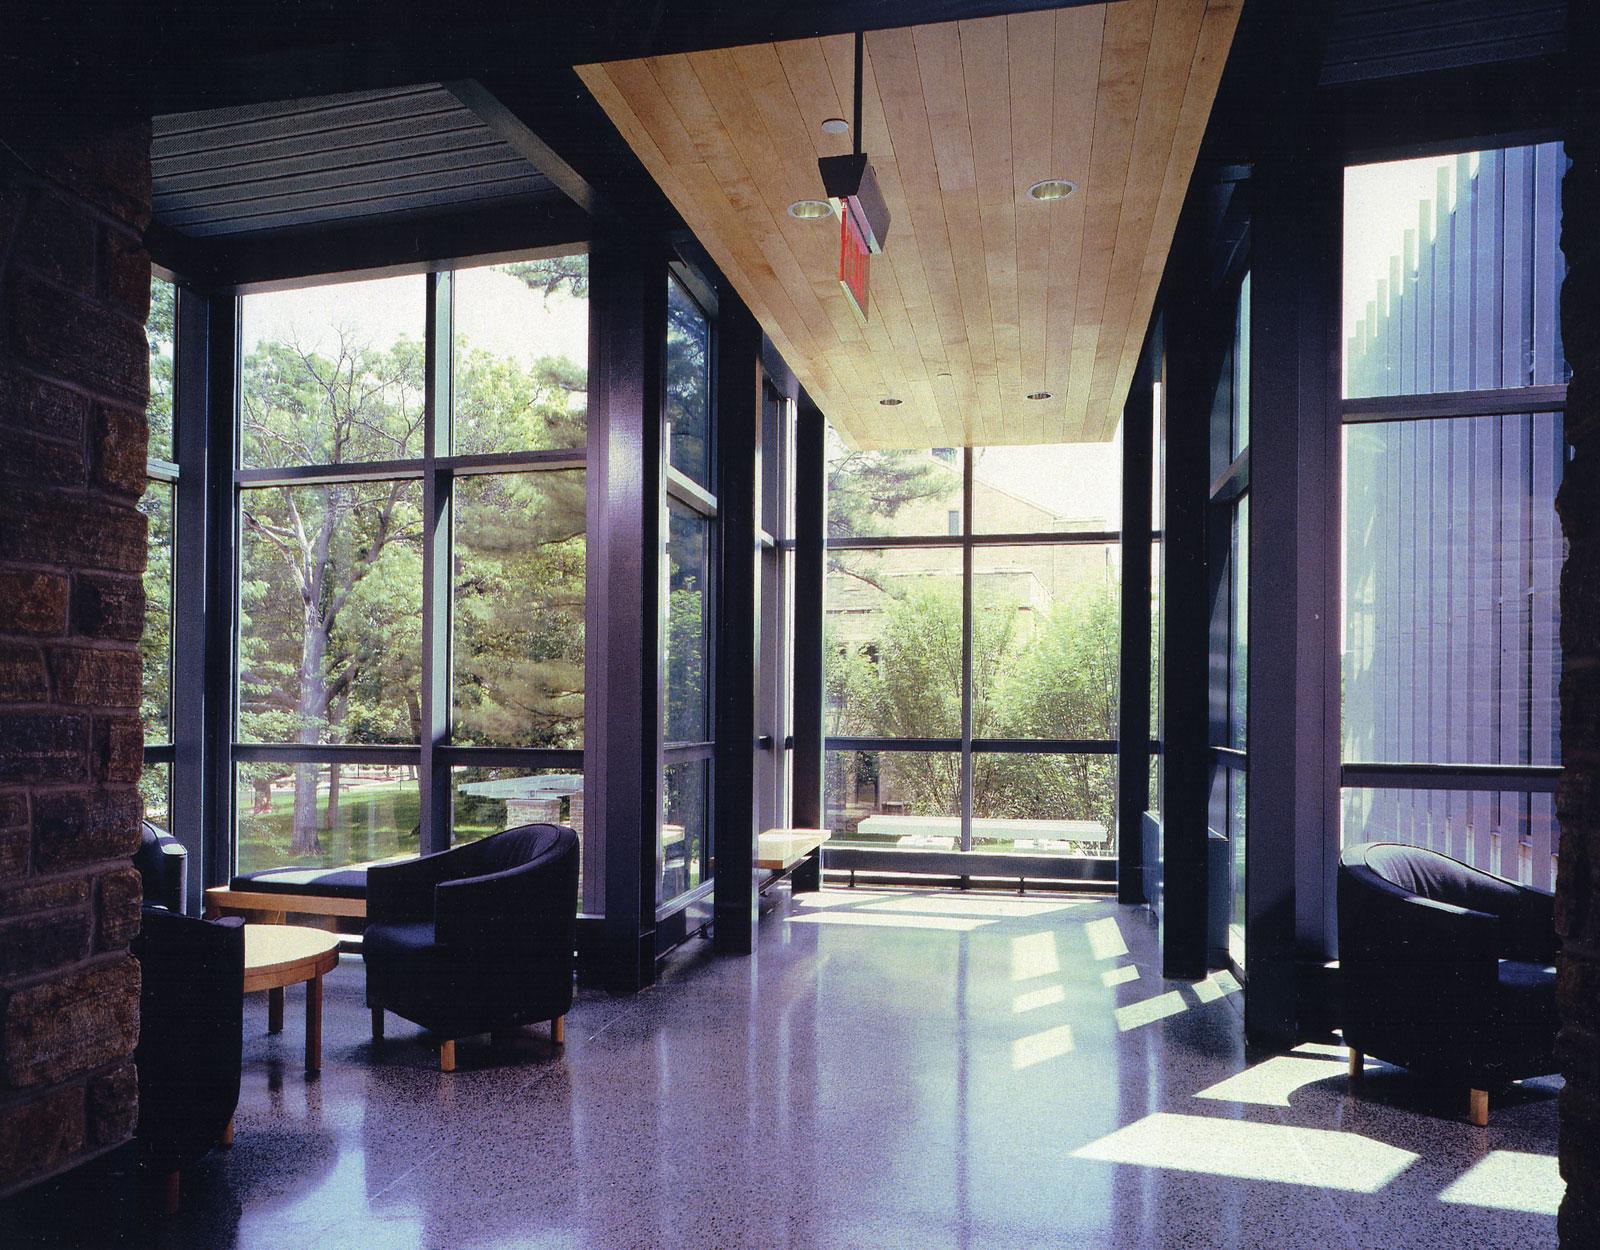 03KD-interior-lounge.jpg